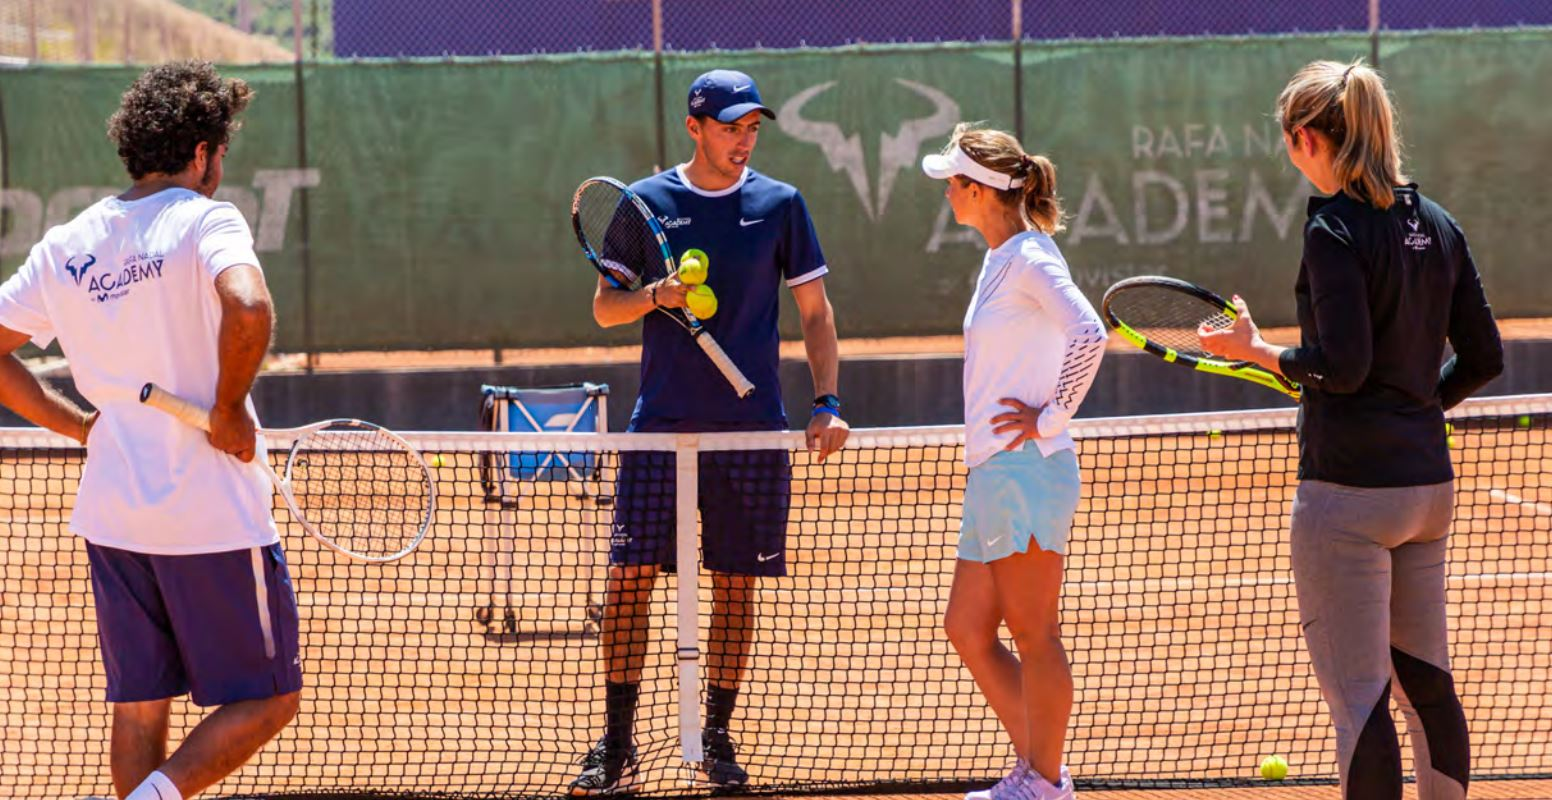 Rafa Nadal Academy Cancun 4.JPG